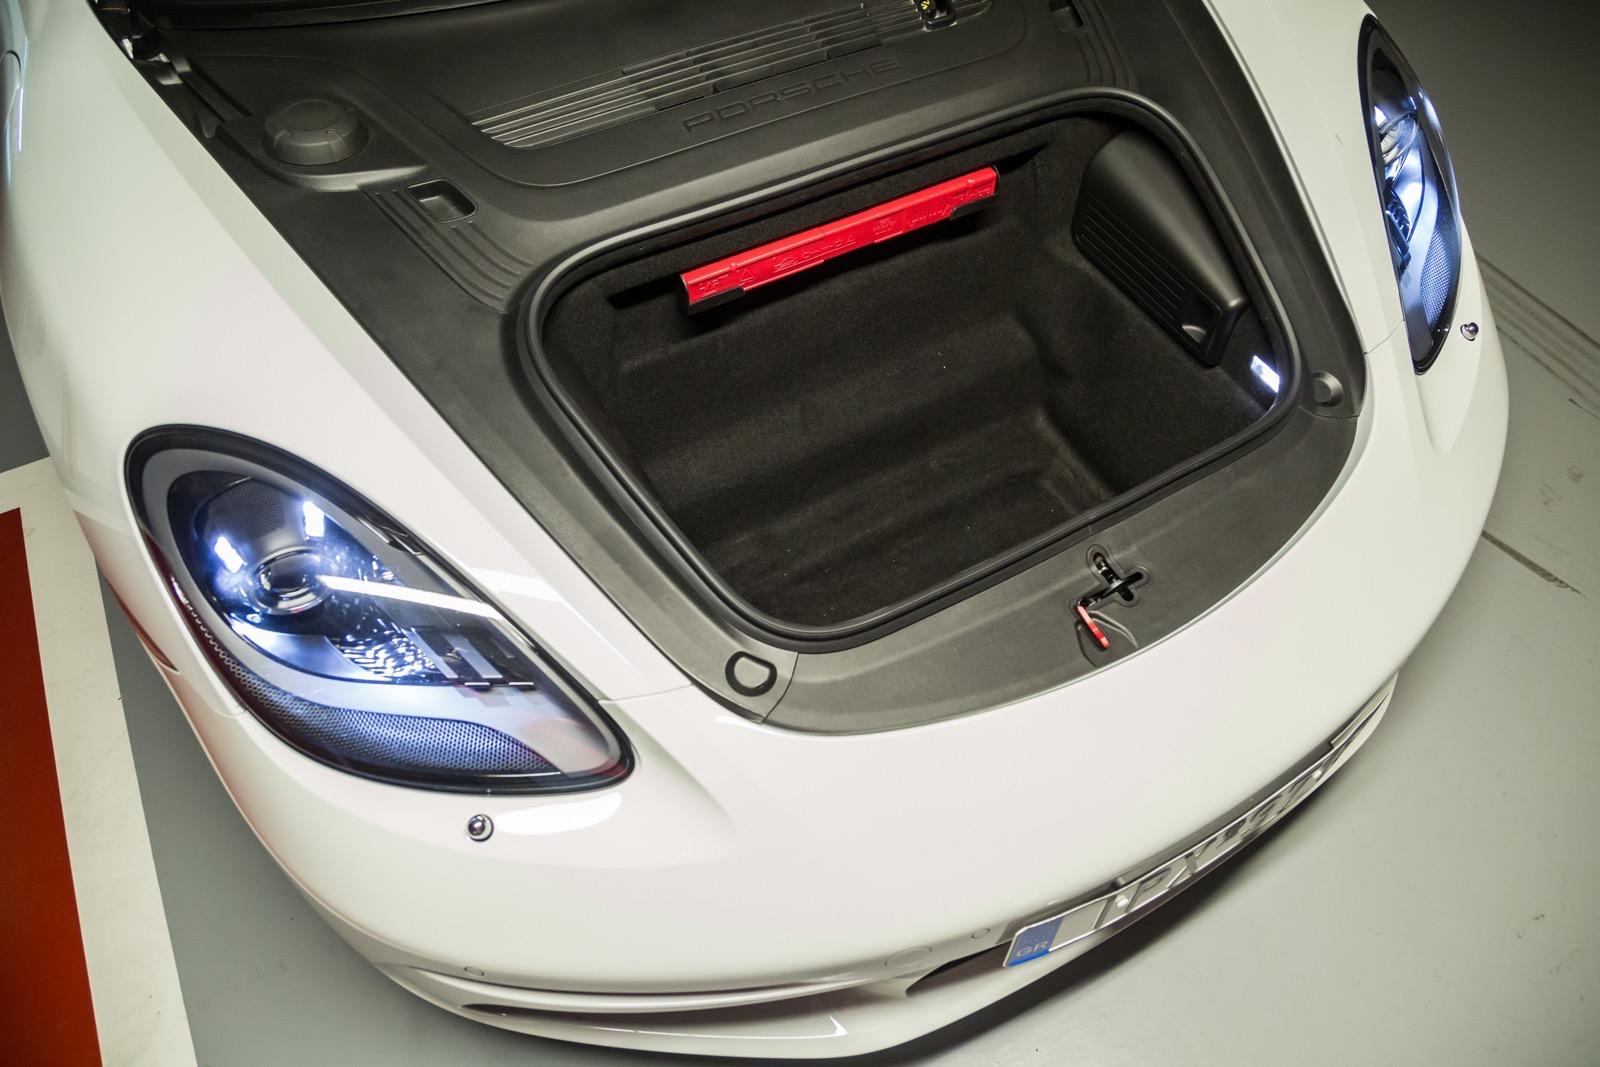 Test_Drive_Porsche_718_Boxster_82